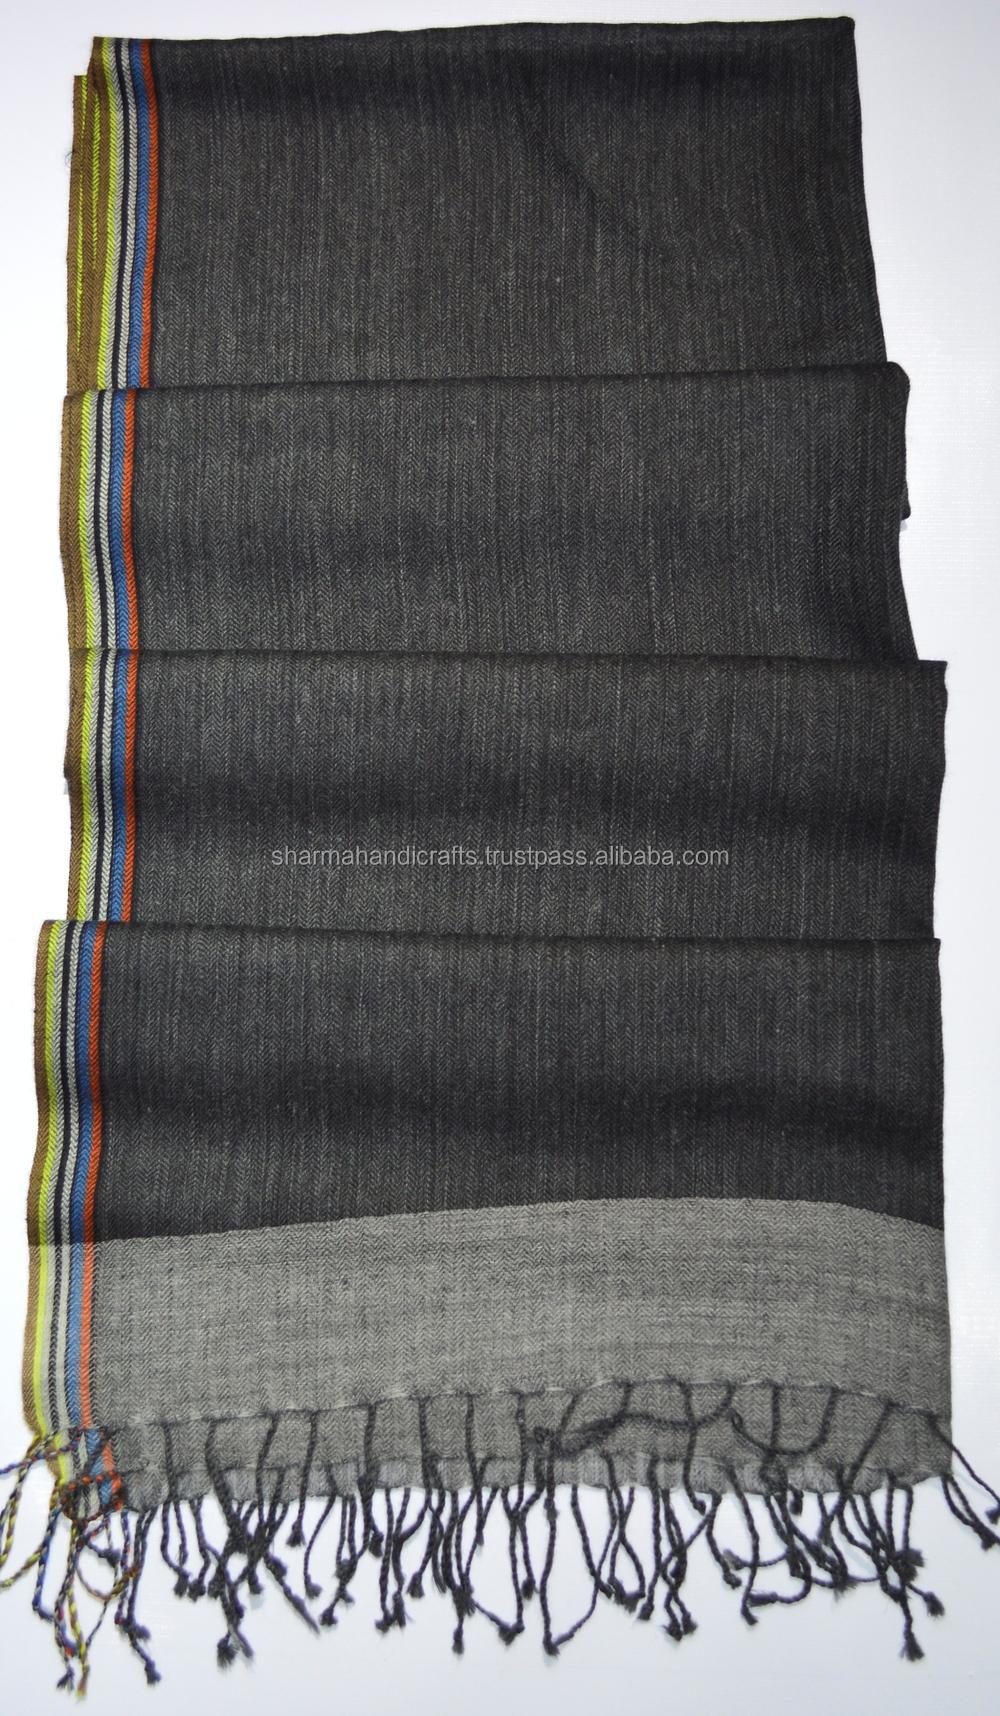 Men Woolen Tartan Muffler Scarves Plain Check Wide Range Of Colors Scarf Ready Stock Low Moq Buy Men Woolen Muffler Men Scarf Tartan Scarf Product On Alibaba Com